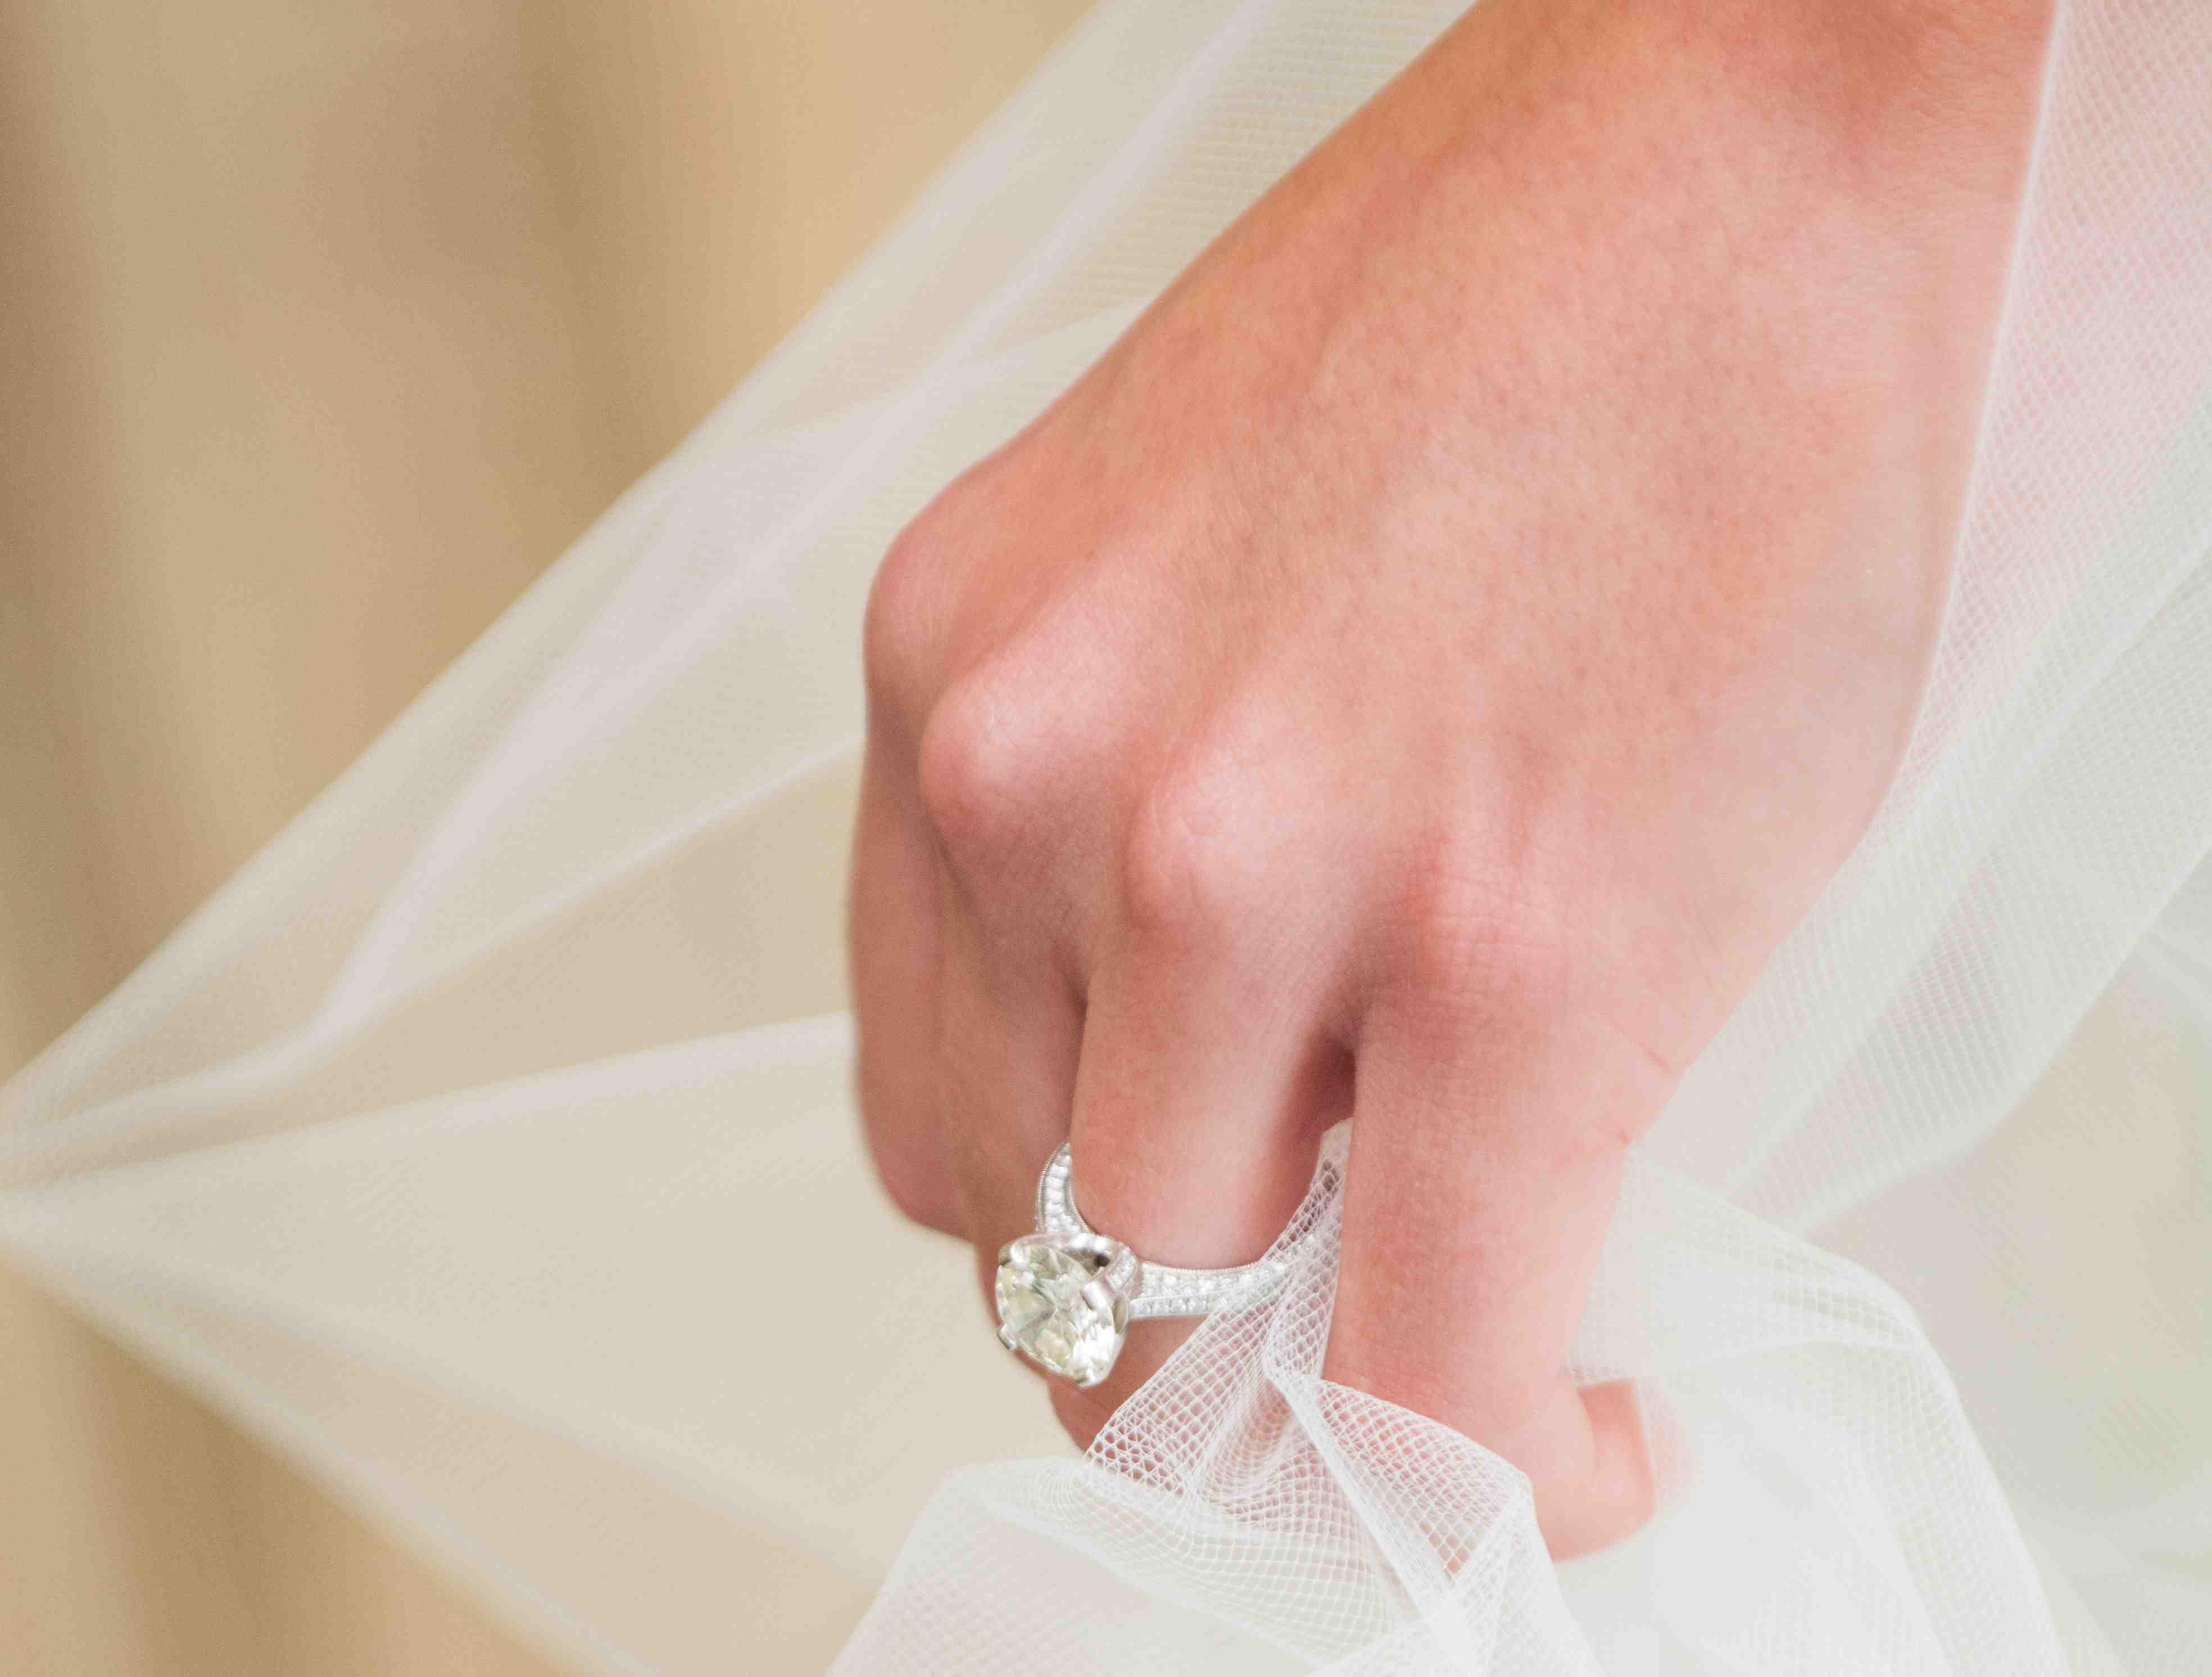 morena baccarin engagement ring inspiration white gold pavé diamond band